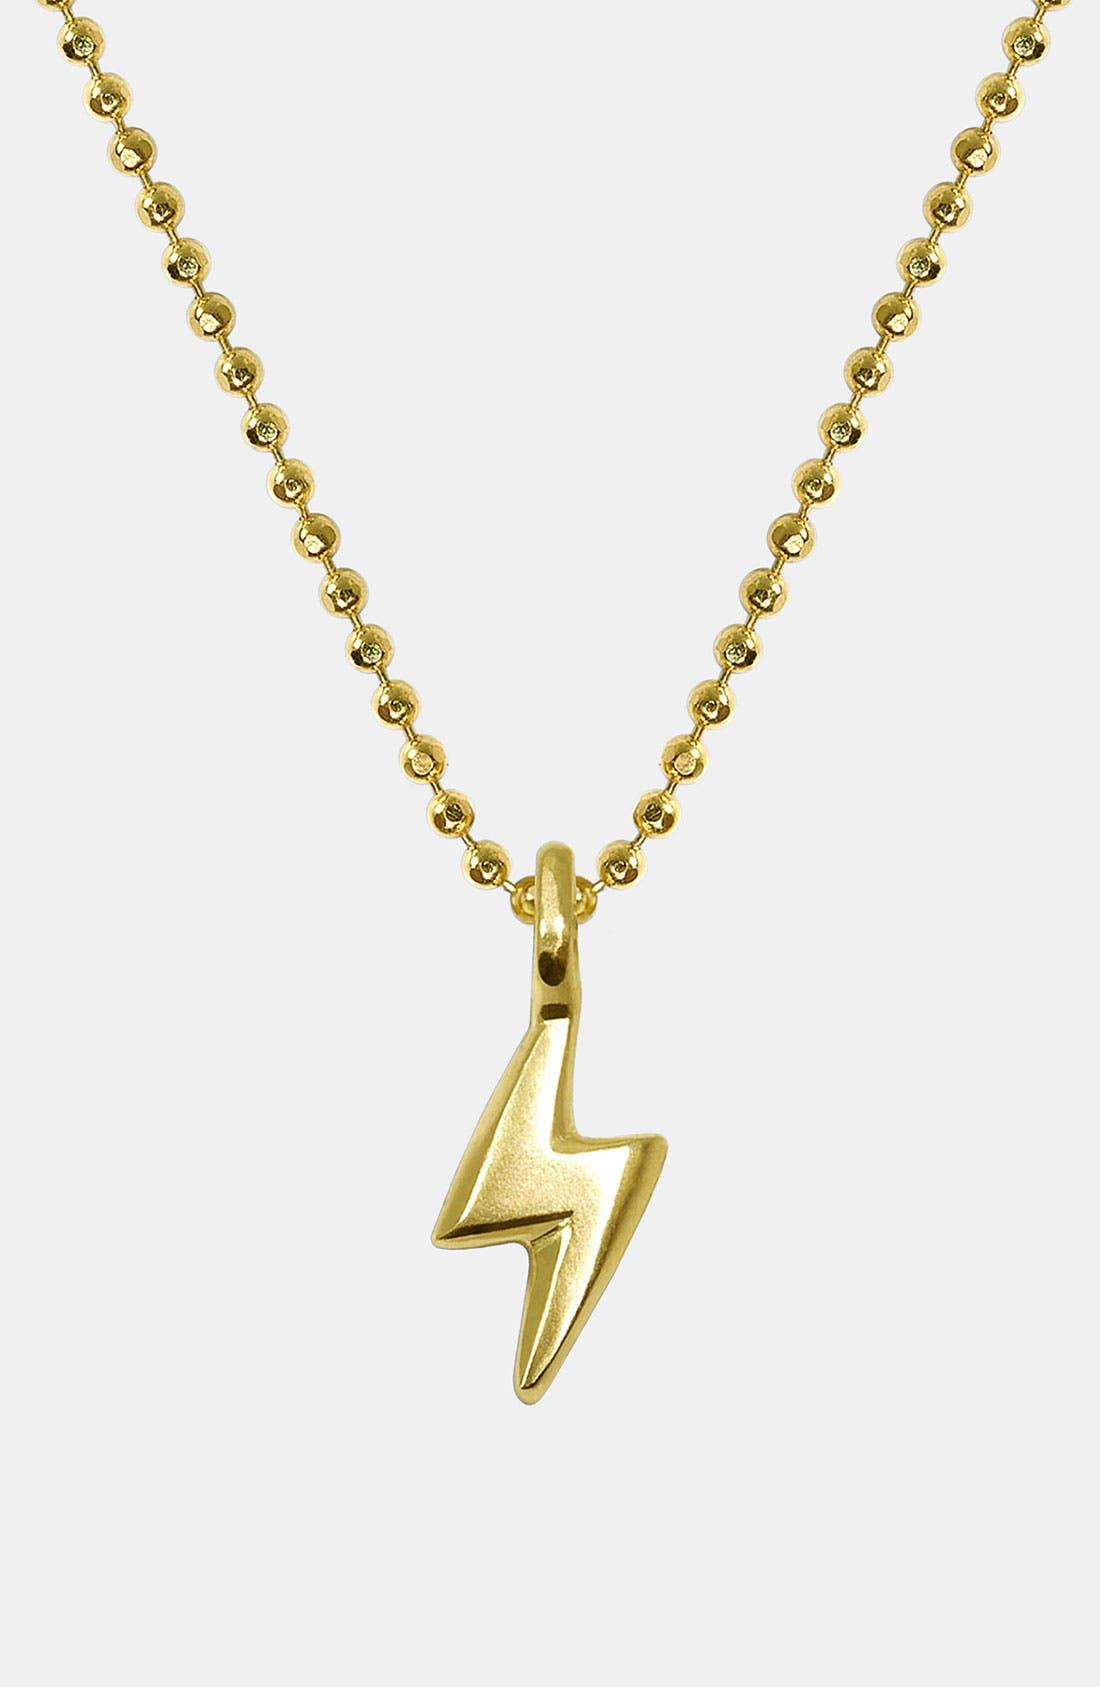 Alternate Image 1 Selected - Alex Woo 'Mini Lightening Bolt' 14k Gold Pendant Necklace